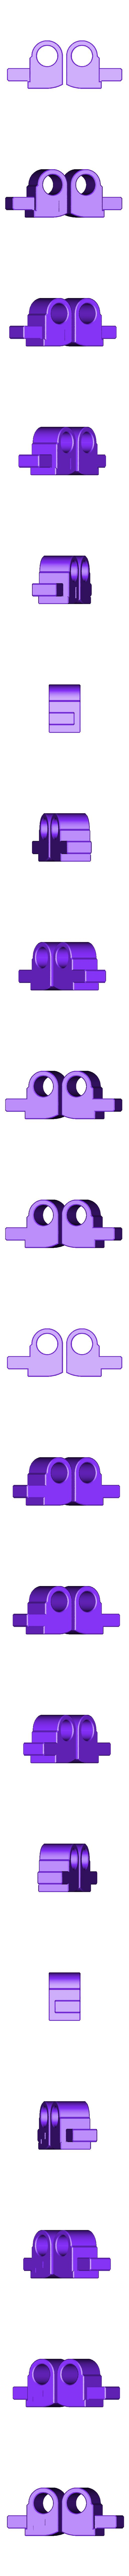 58_Drag_Leg8_KneeJoin_BLACK.stl Download STL file ARTICULATED DRAGONLORD (not Dragonzord) - NO SUPPORT • 3D printer model, Toymakr3D